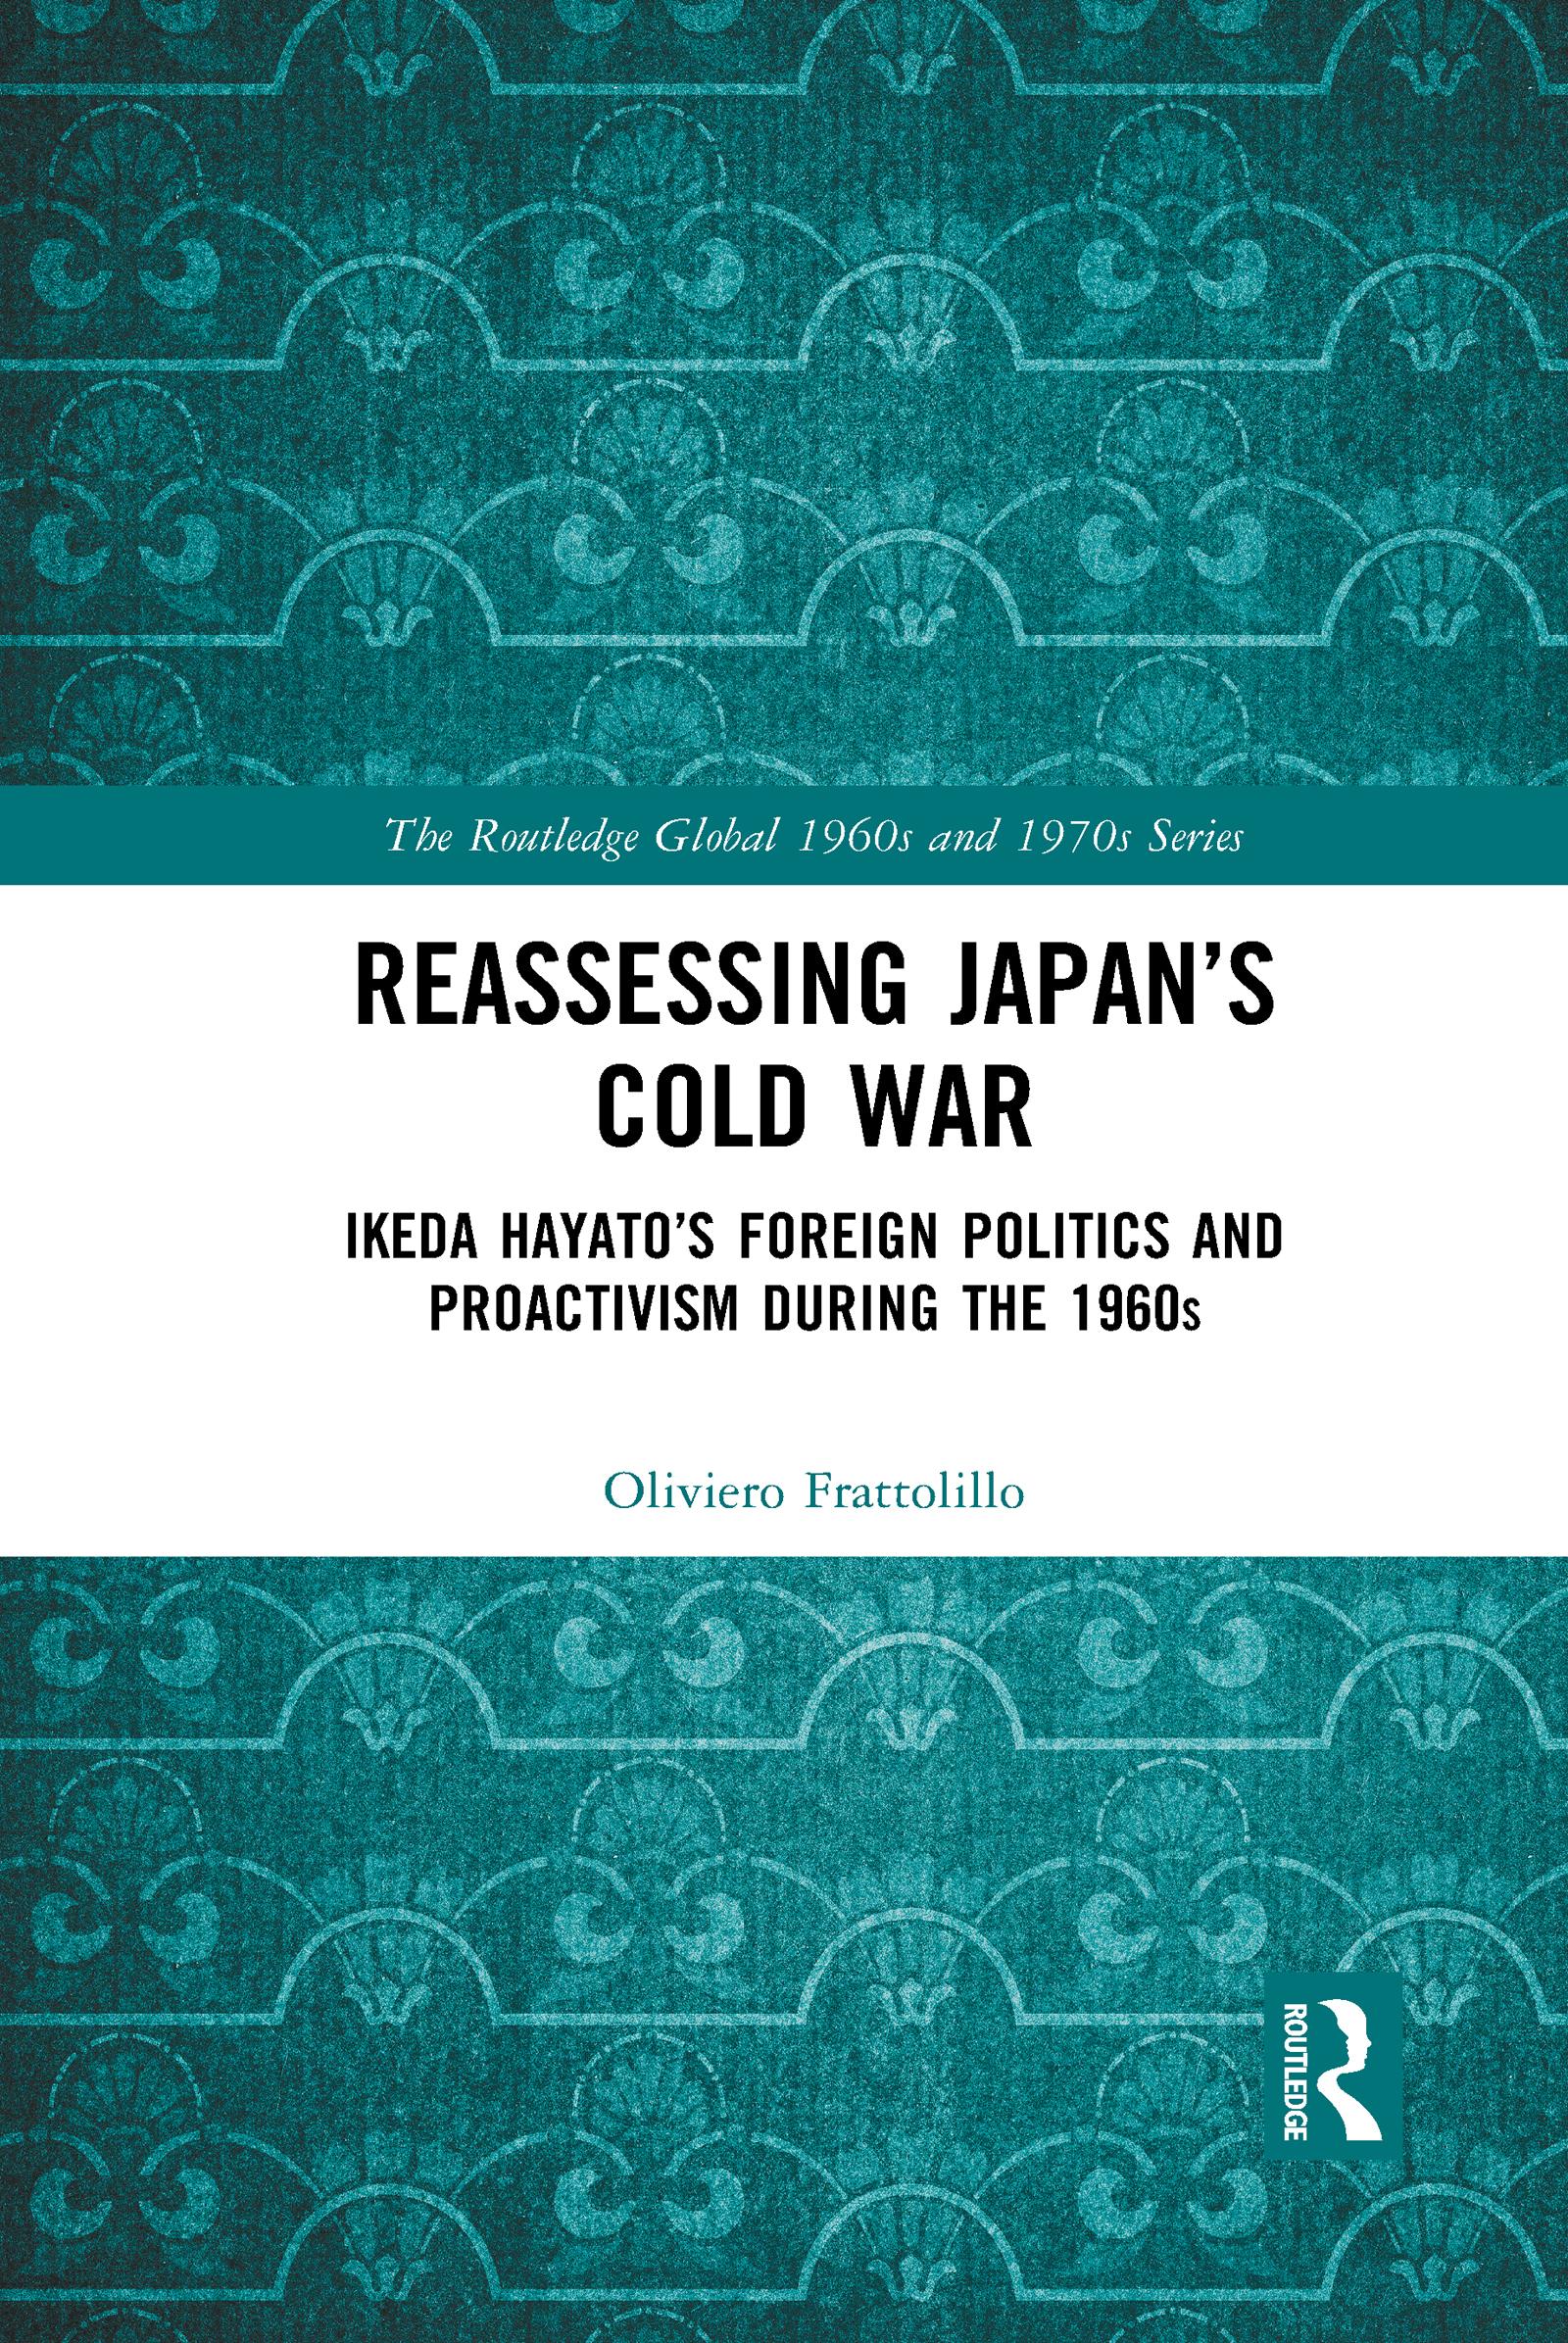 Reassessing Japan's Cold War